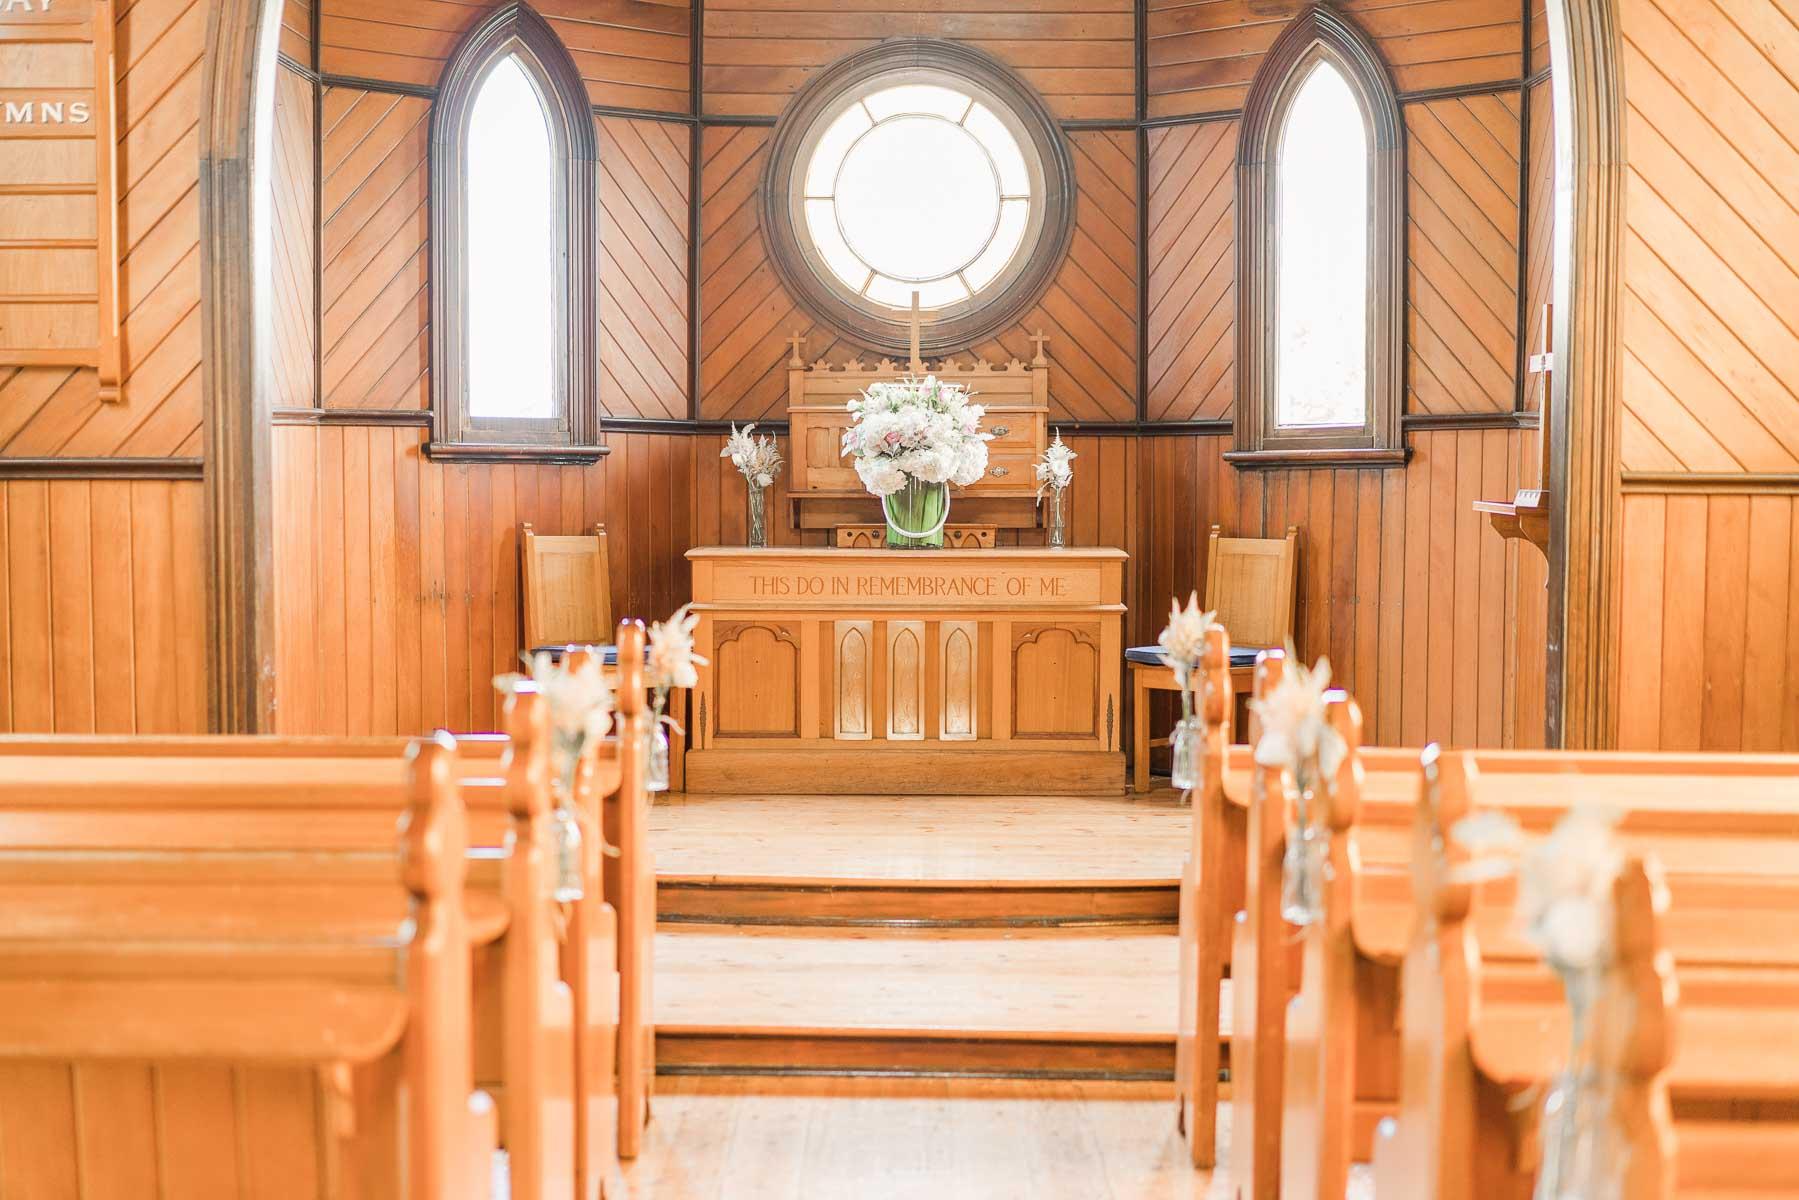 trenavin-chapel-phillip-island-wedding-heart+soul-weddings-sally-sean-09984.jpg